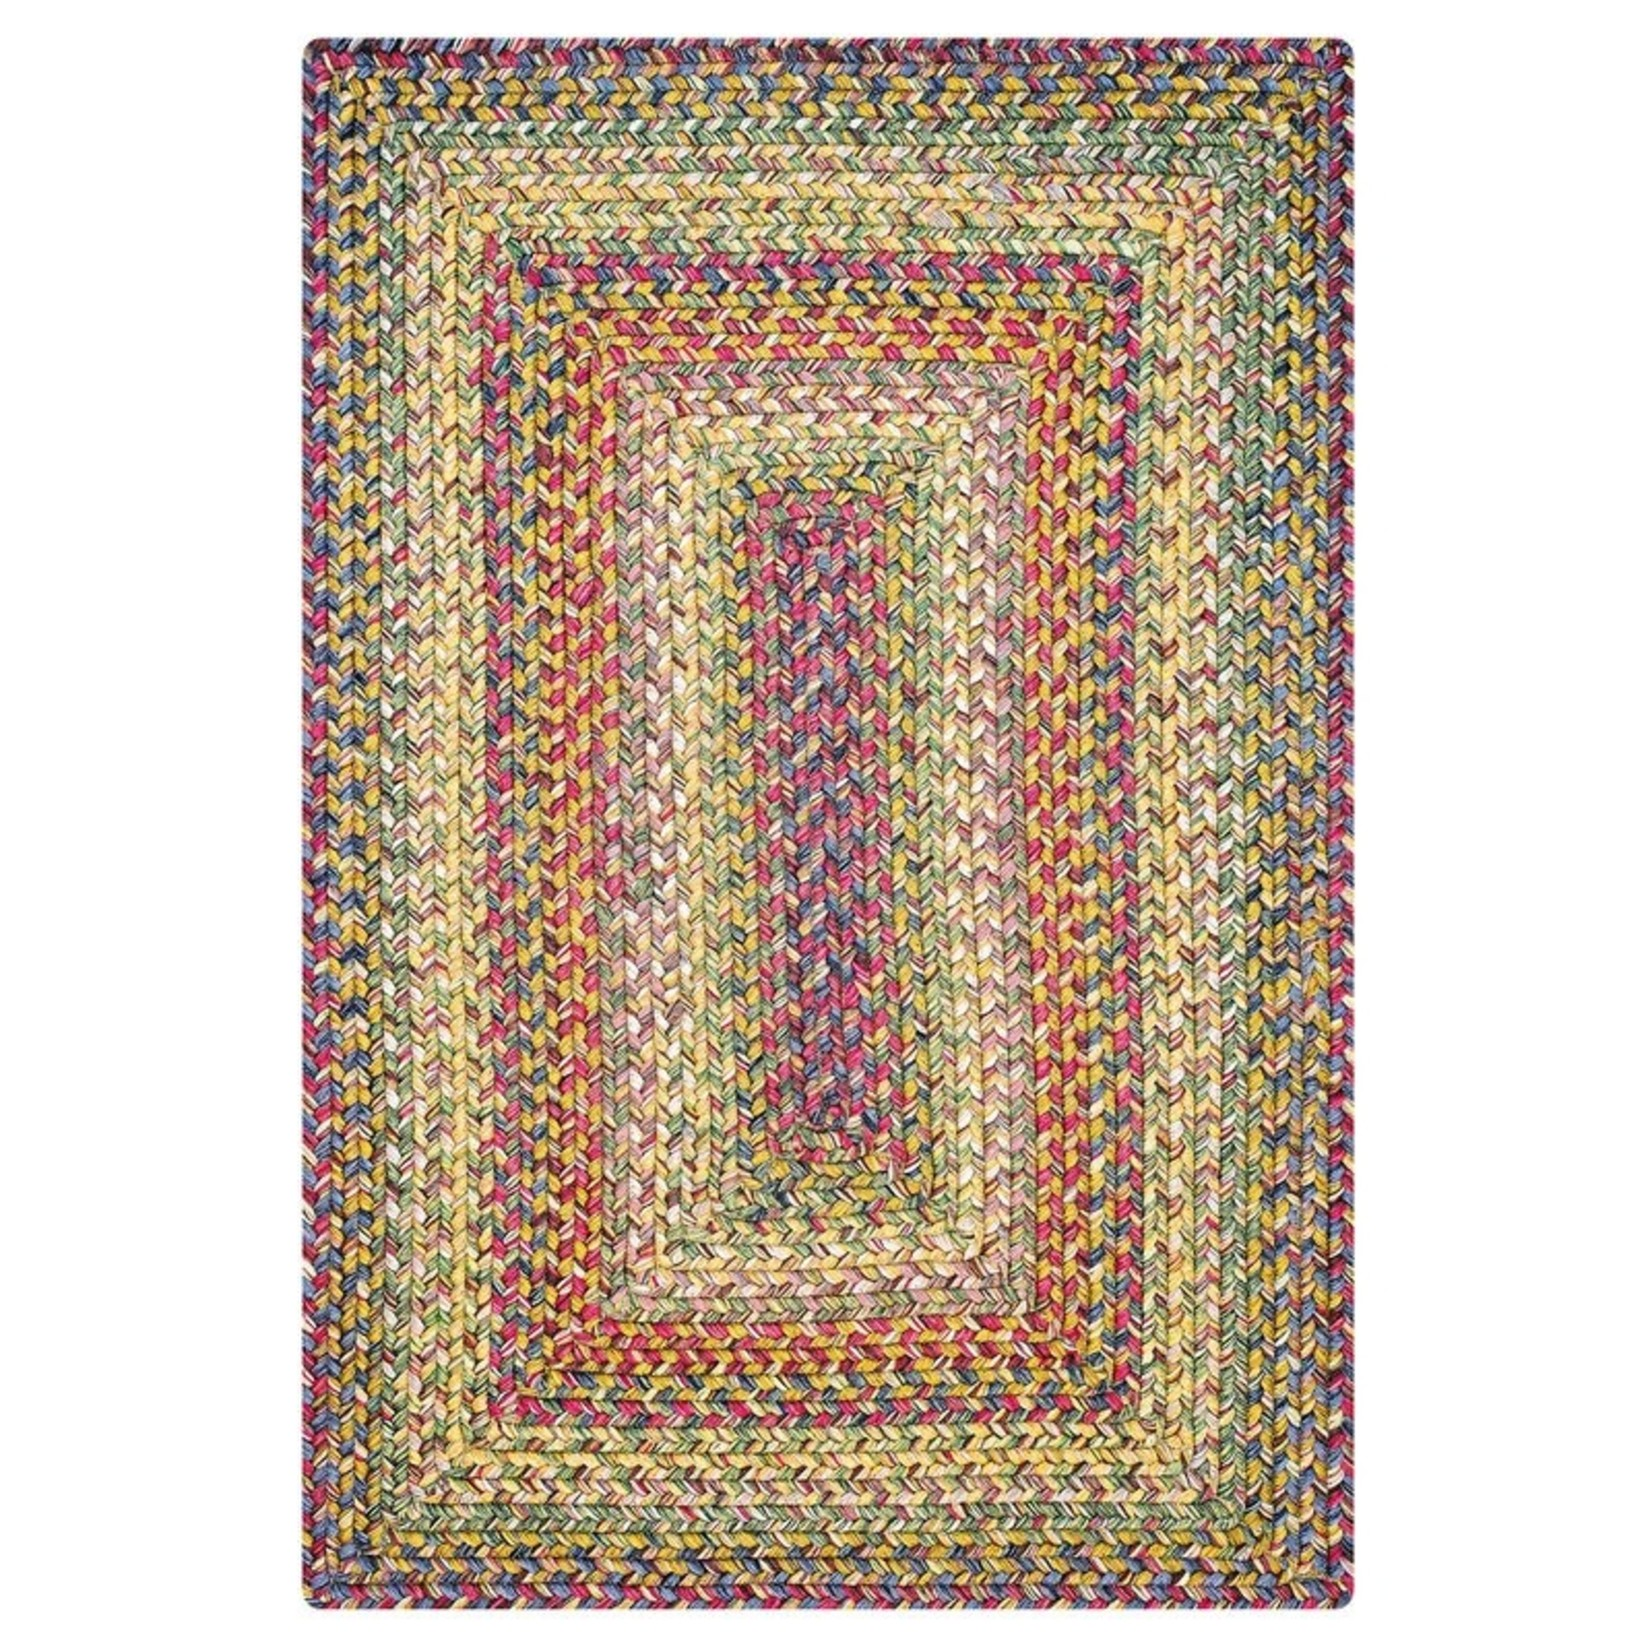 *5' x 8' - Kennemer Ultra-Durable Green/Orange Area Rug